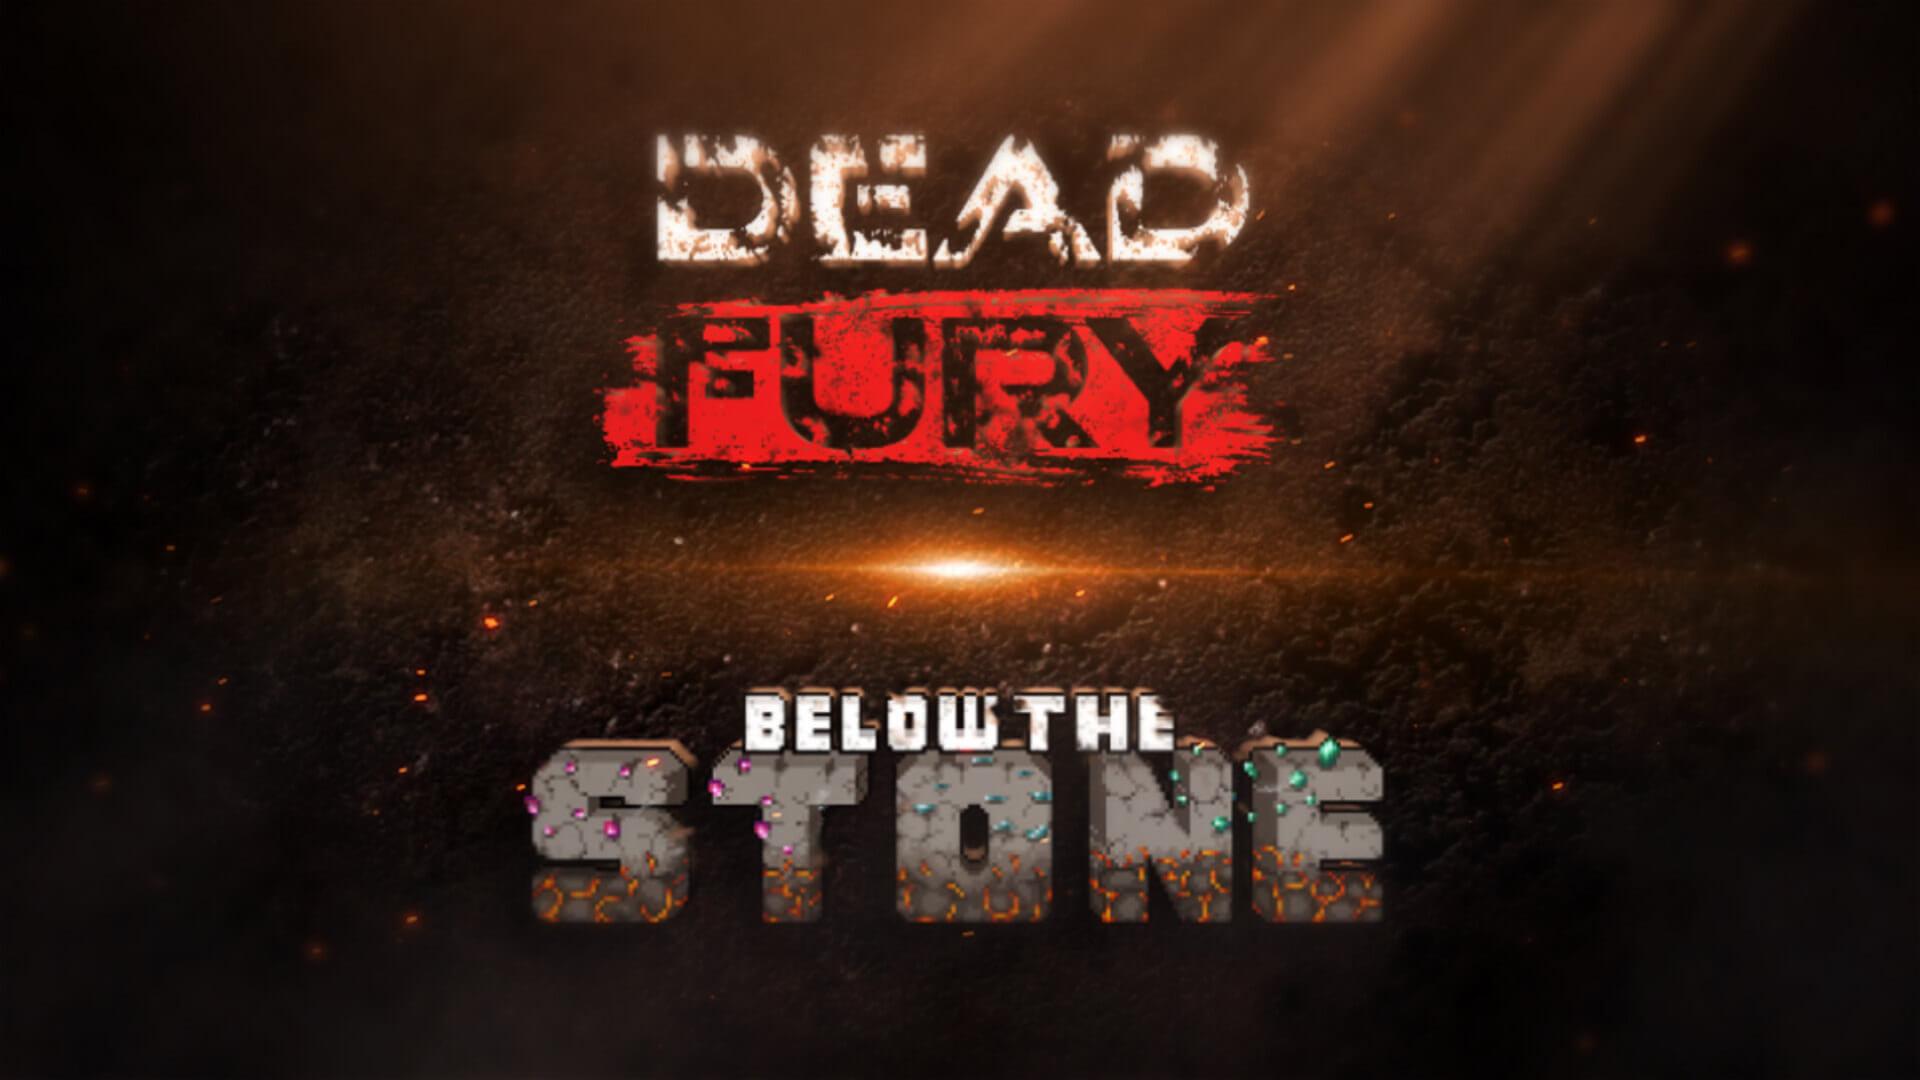 Apogee Entertainment Dead Fury Below the Stone announcement